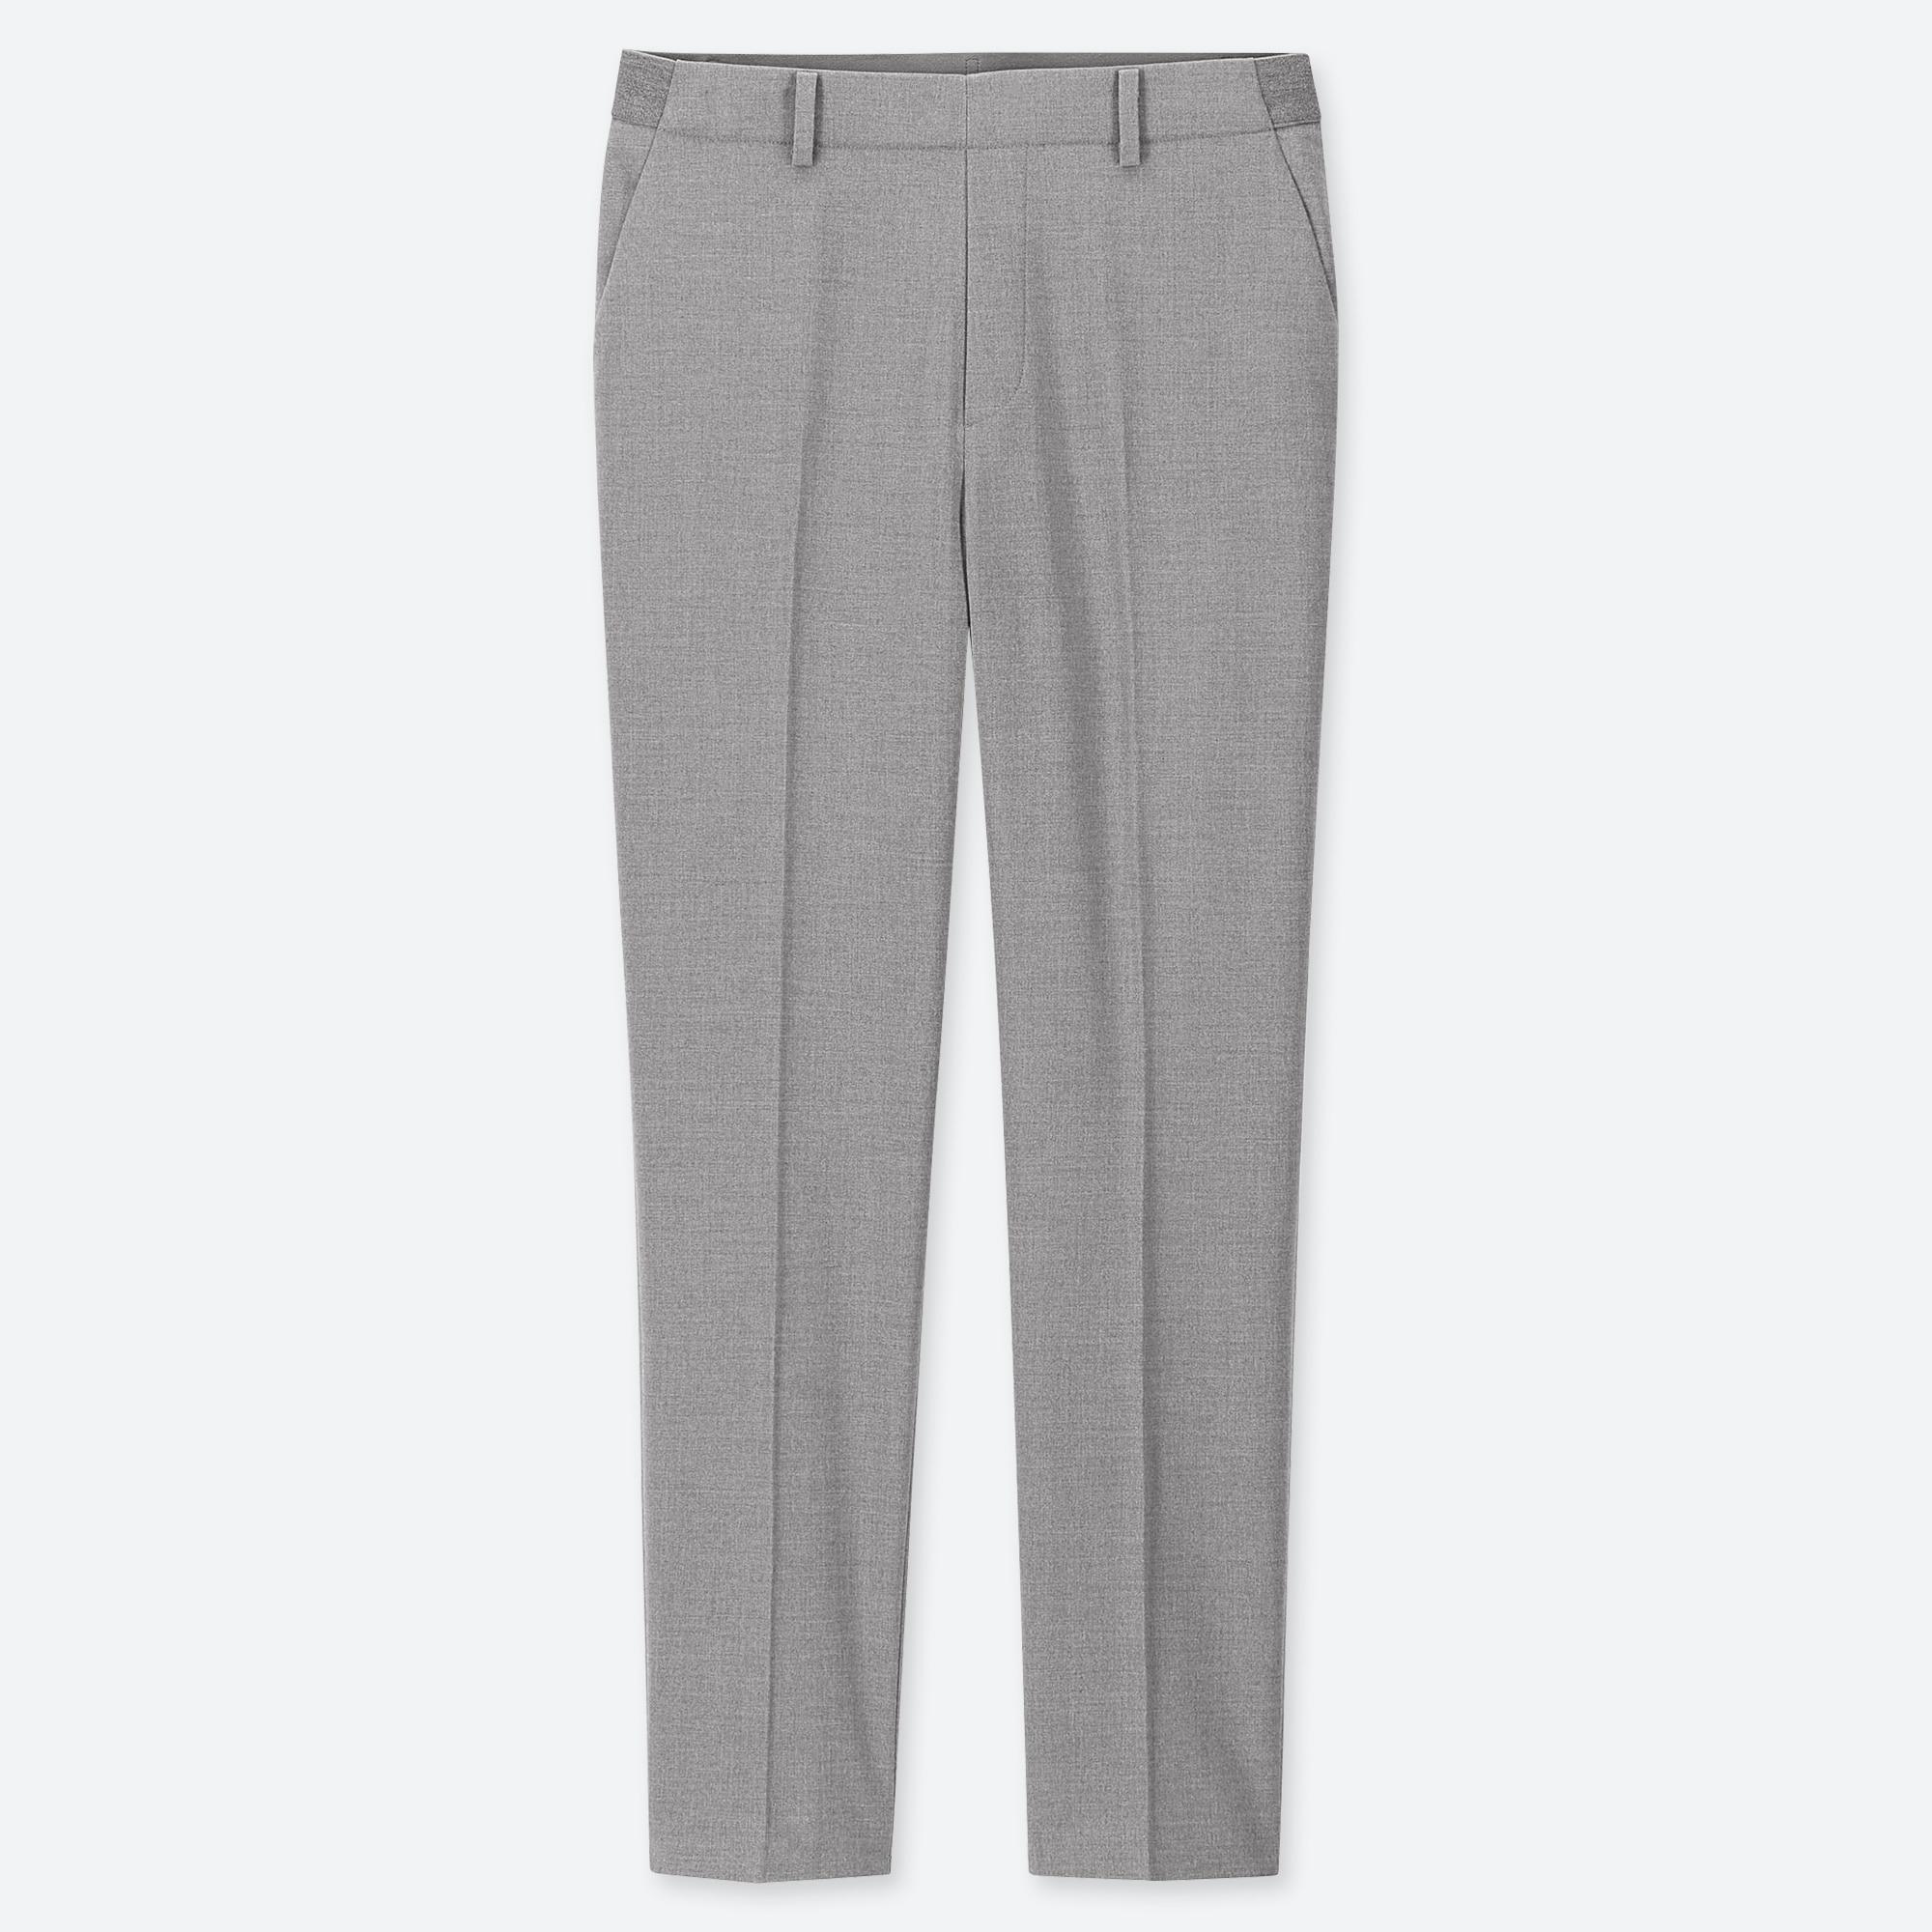 Women's Pants: Casual, Dress, Active & More | UNIQLO US